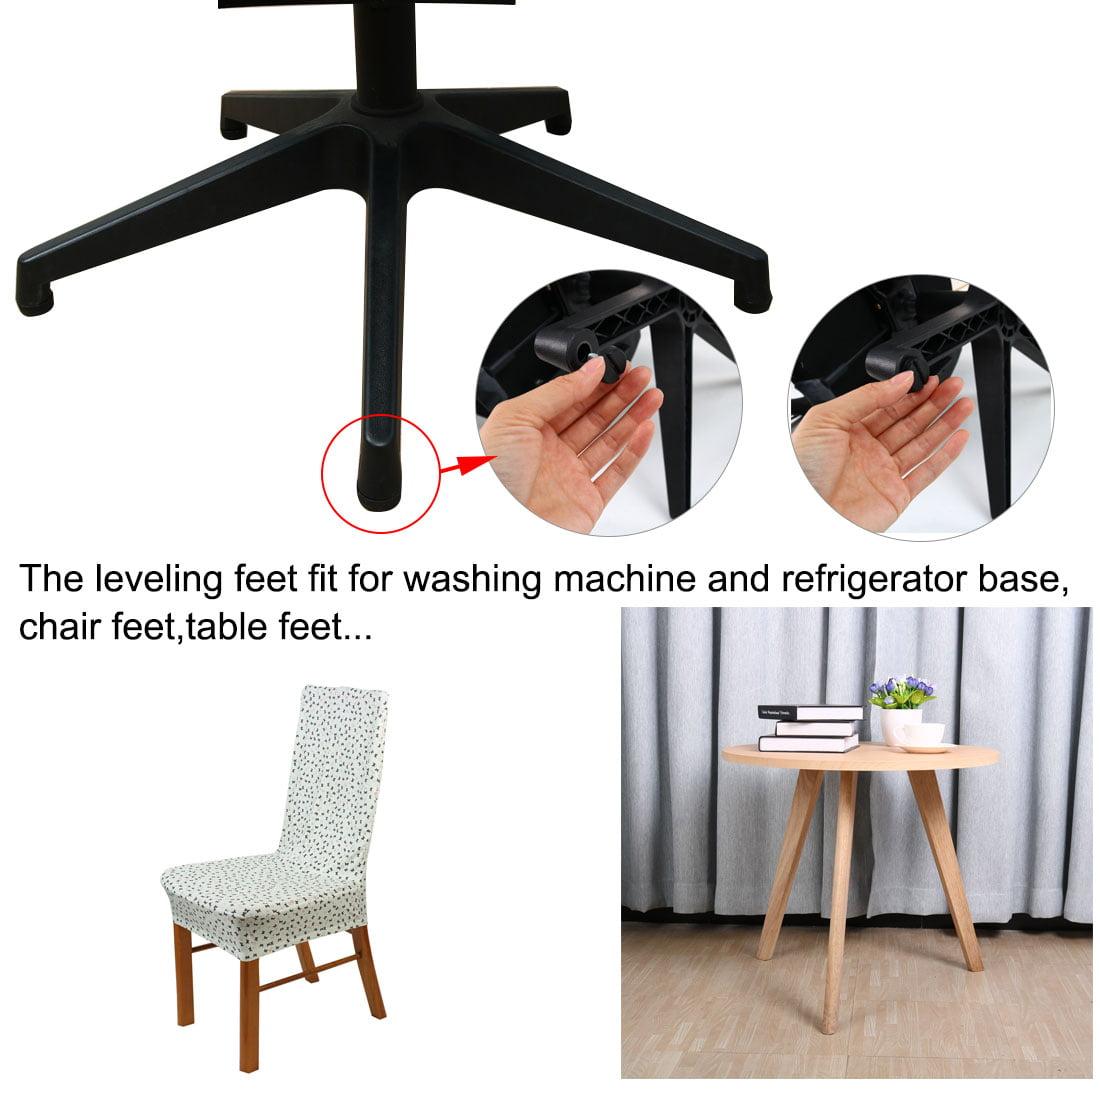 Unique Bargains Home office Table Desk Glide Leveling Foot M6x15mm Thread Black 8pcs - image 2 of 7